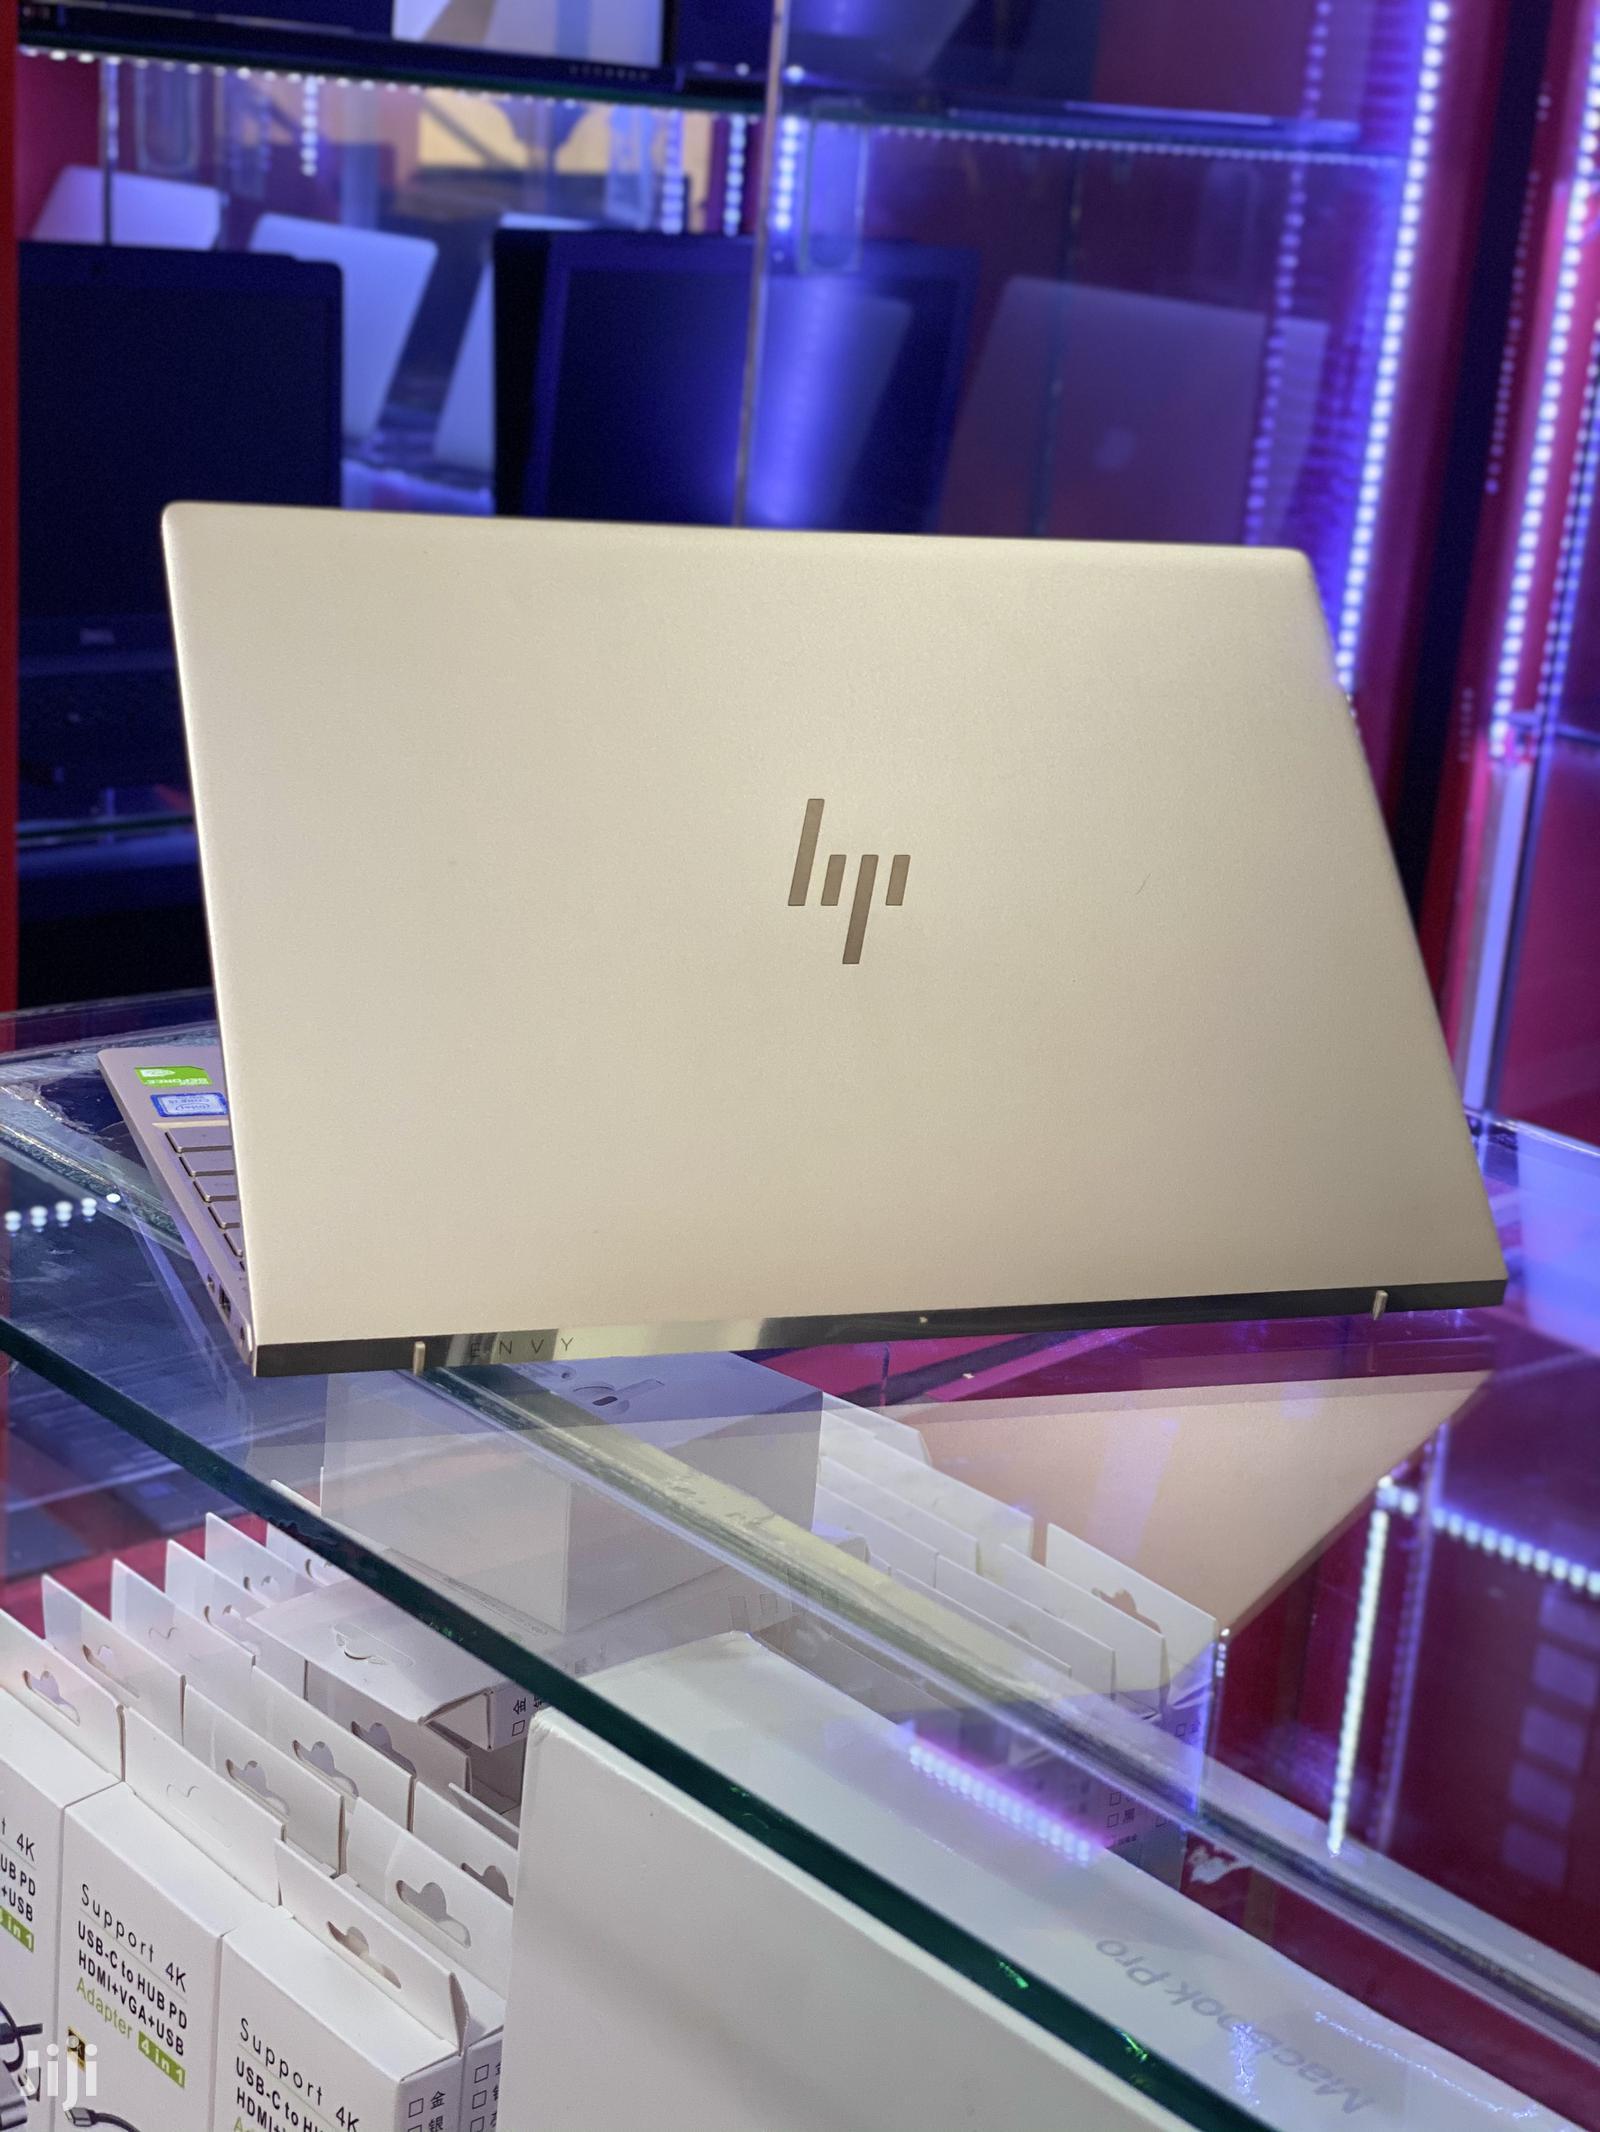 New Laptop HP Envy 13t 8GB Intel Core i5 SSHD (Hybrid) 256GB